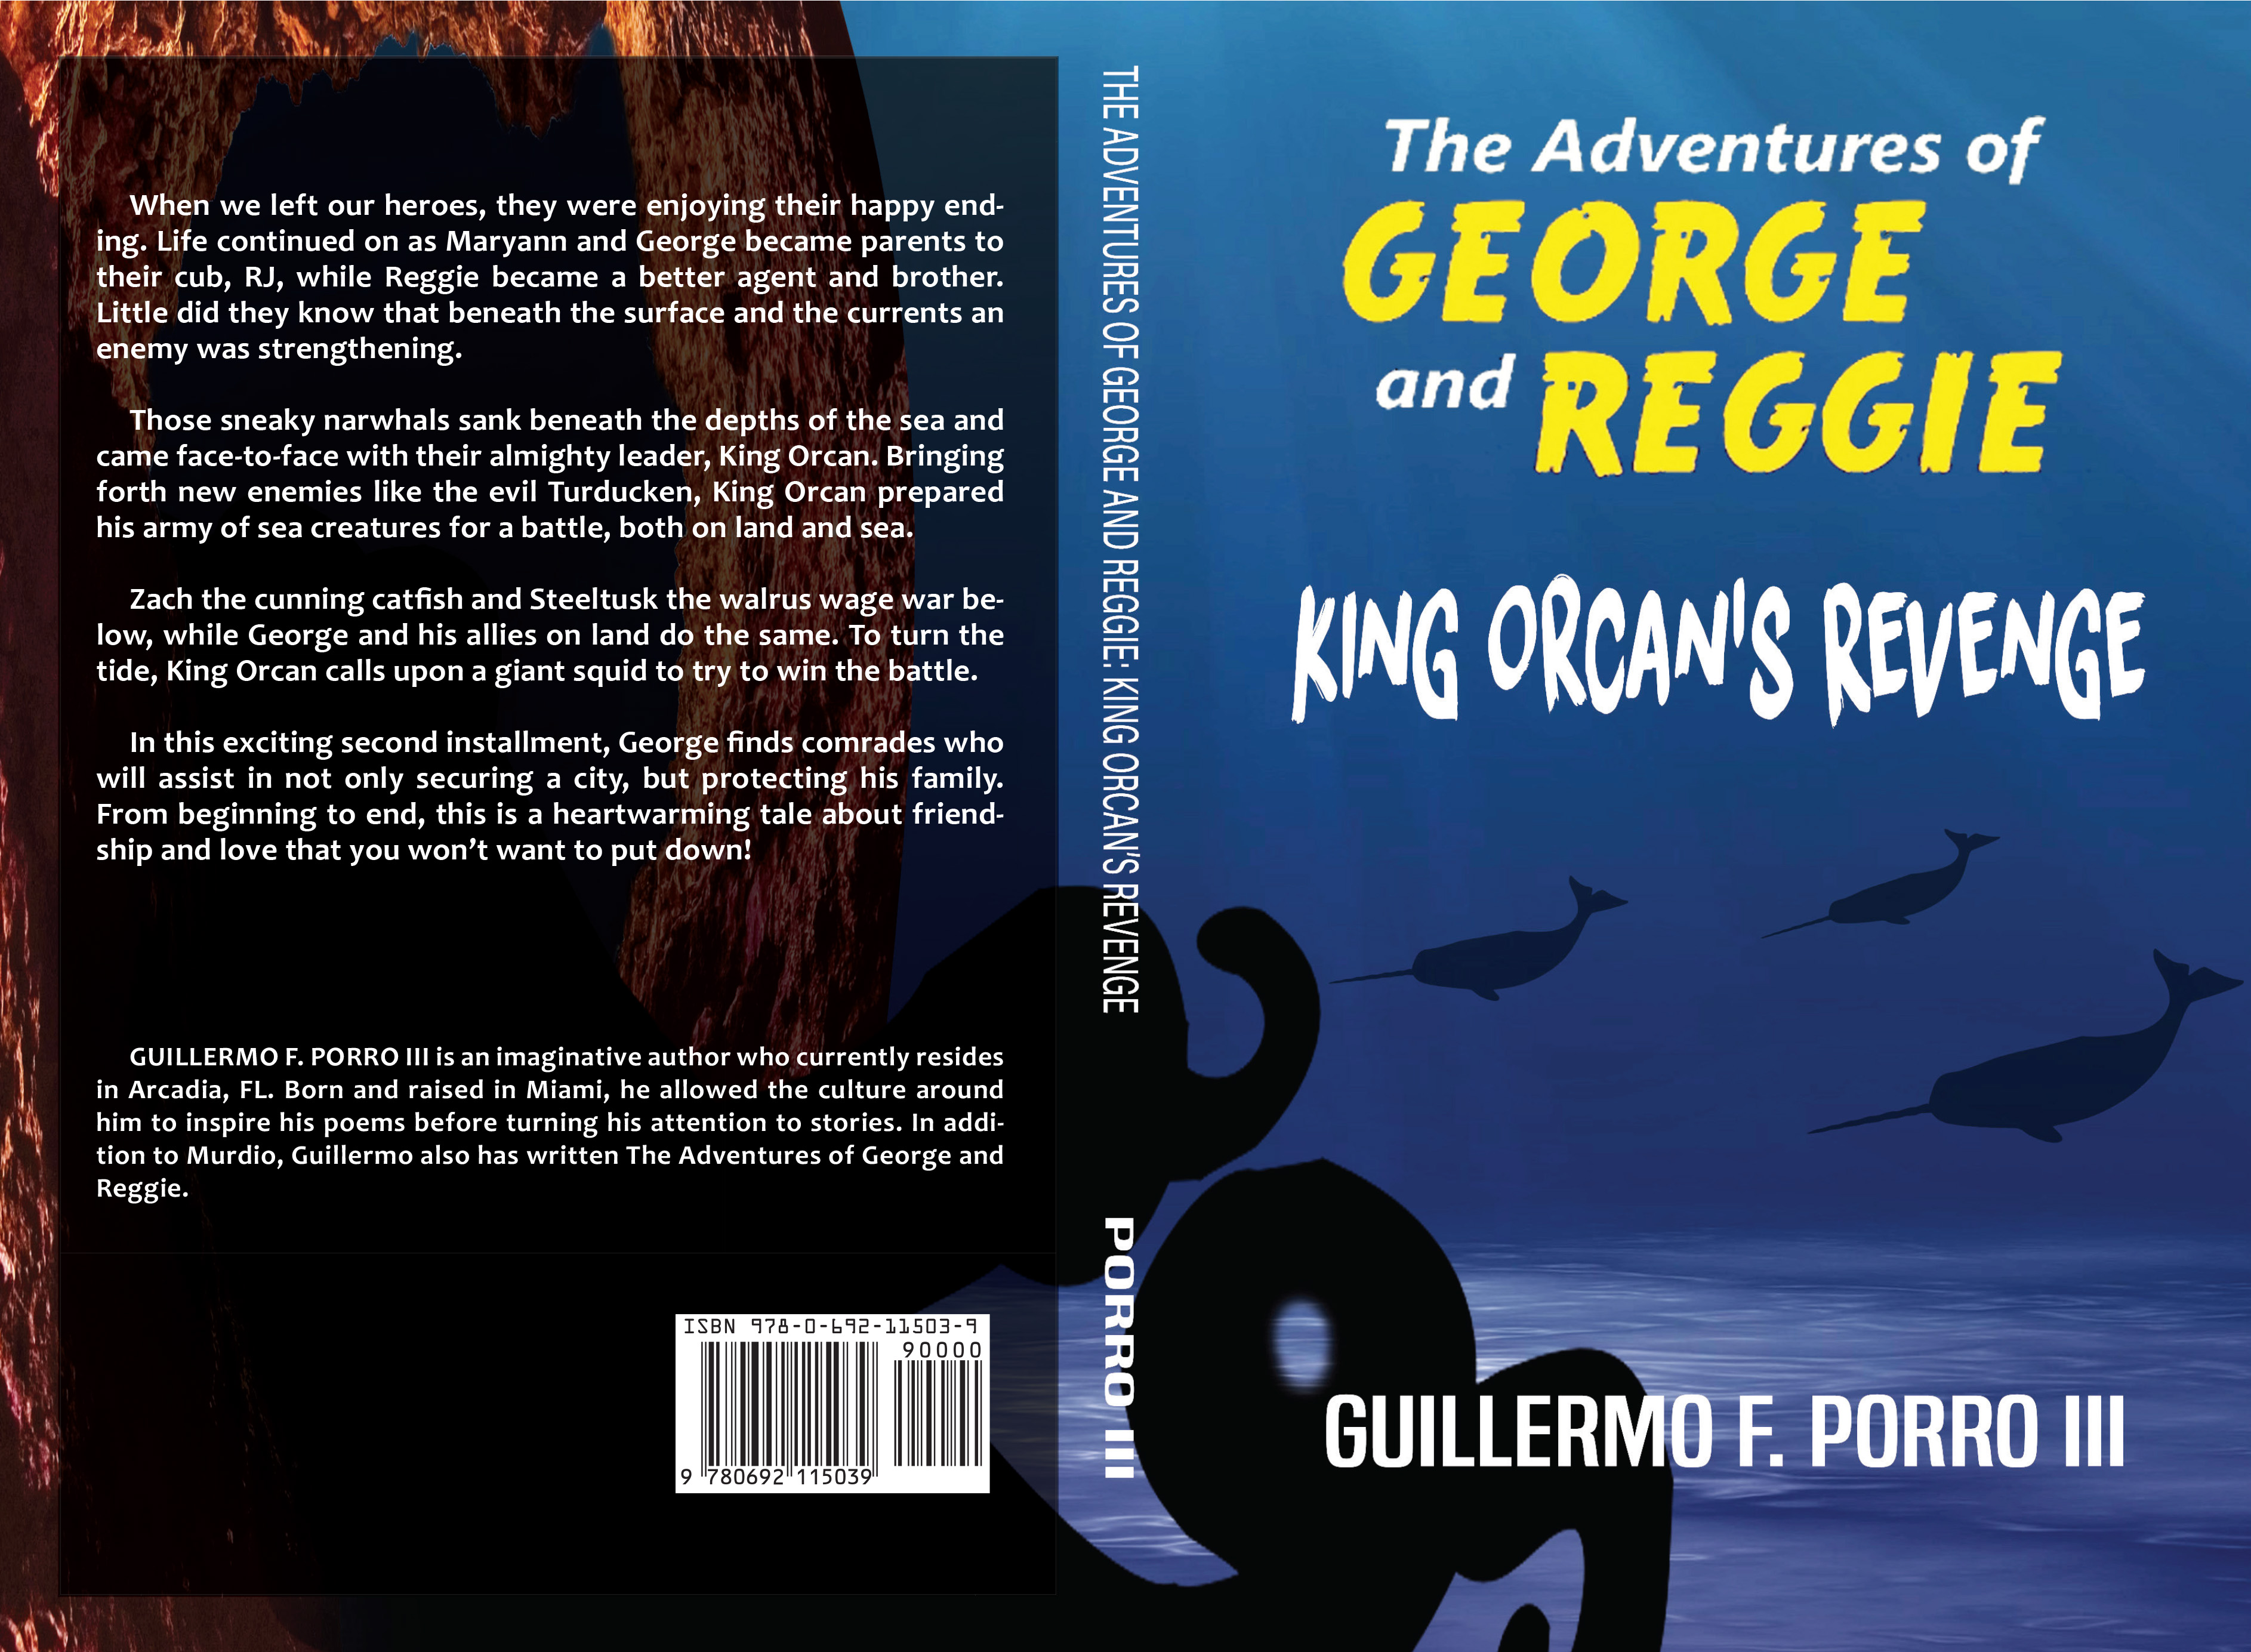 George and Reggie 2